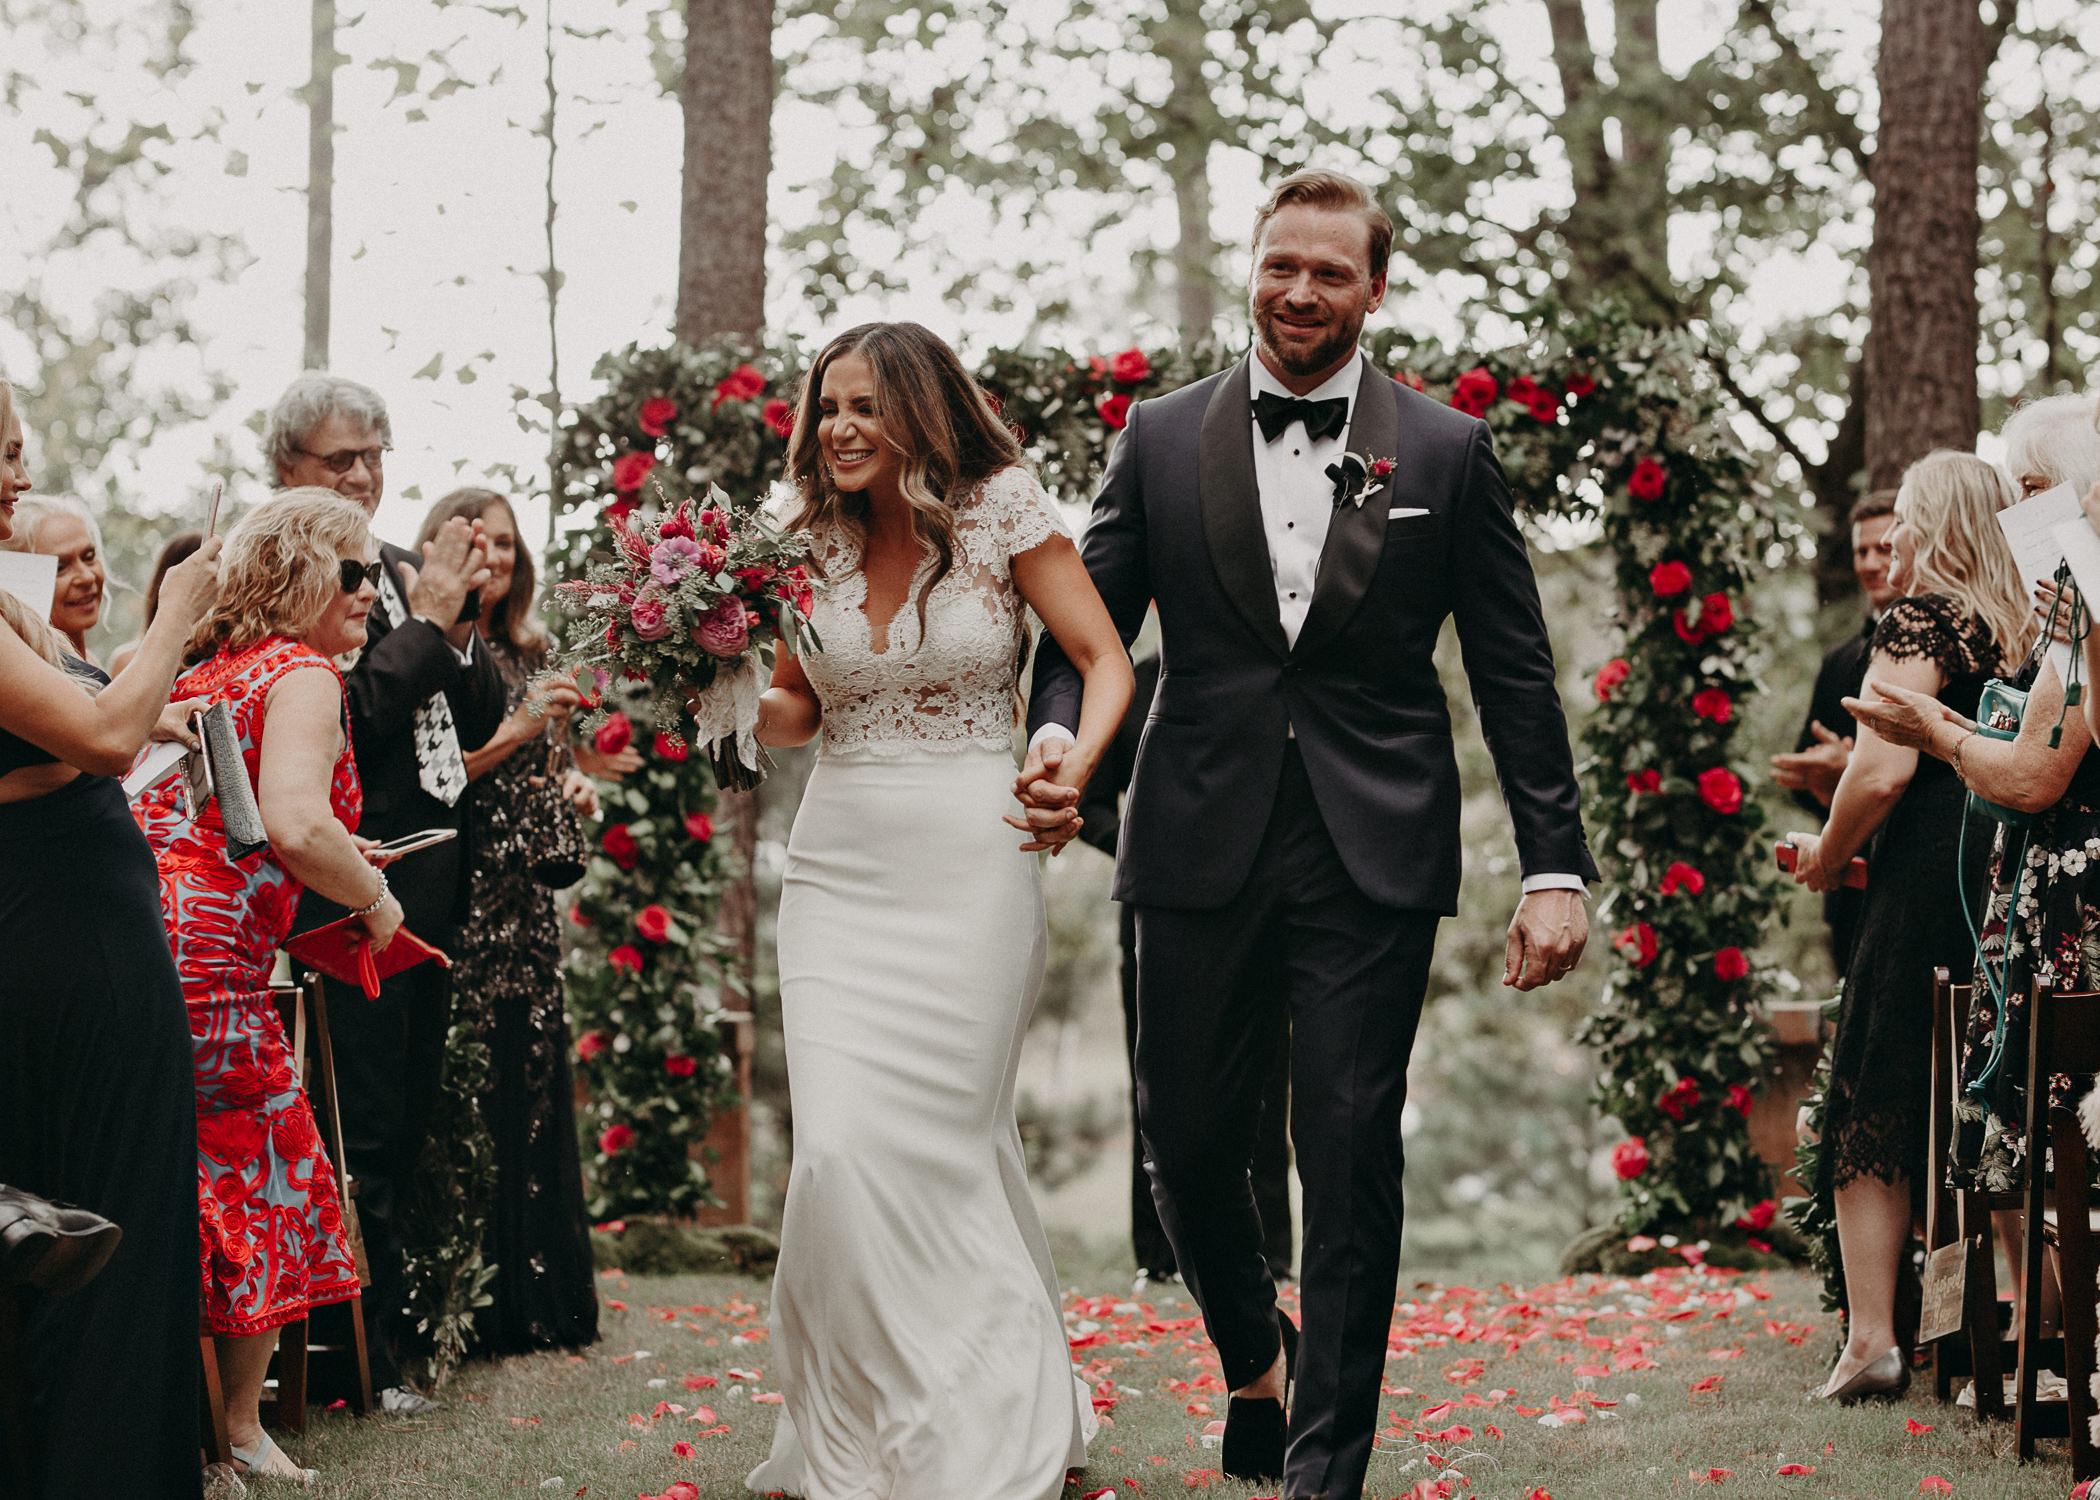 71 - walking down the aisle as husband and wife wedding ceremony at serenbi farms atlanta .jpg